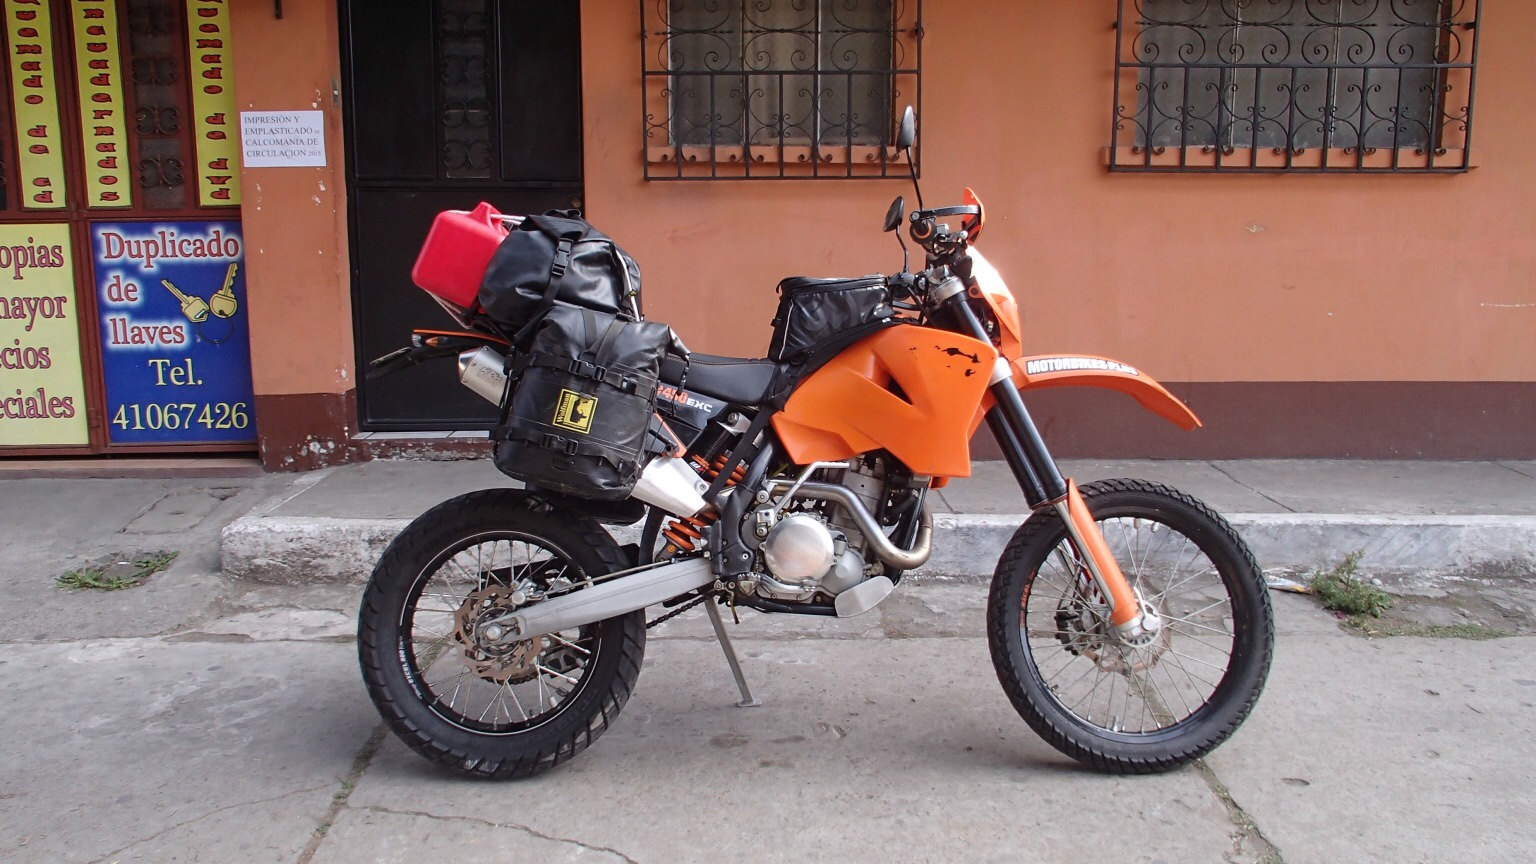 ktm 500 exc as adventure bike? - Horizons Unlimited - The HUBB